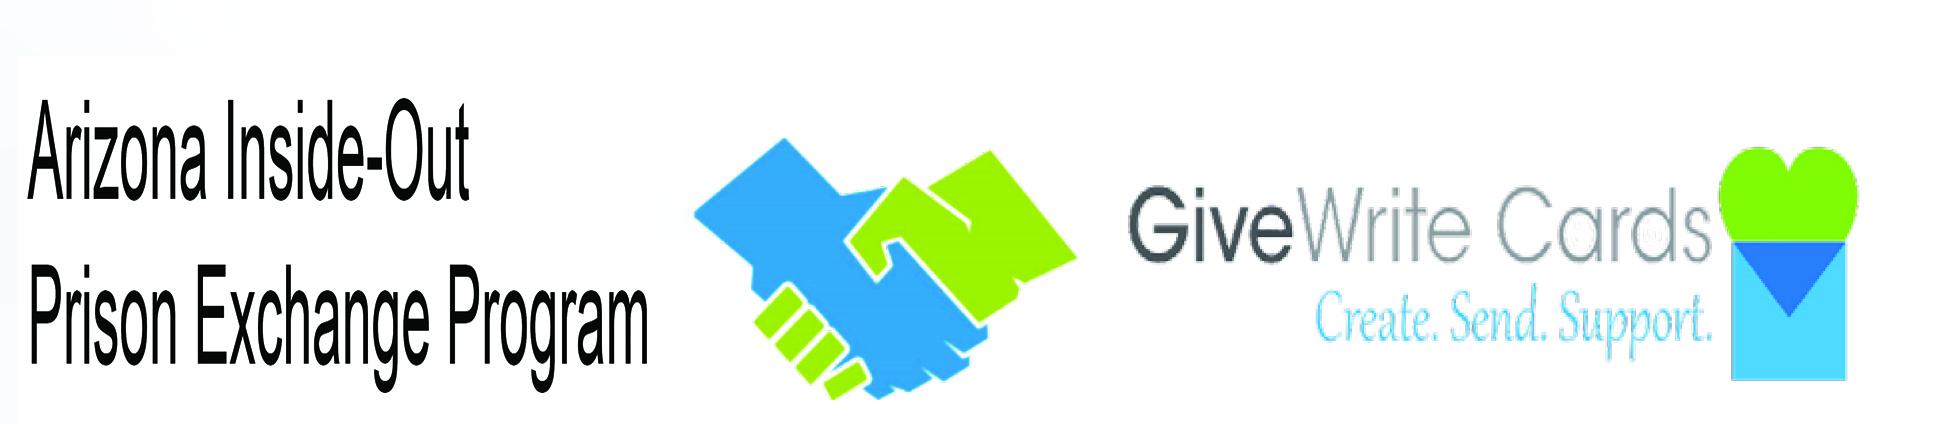 io-gw-partnering1.jpg